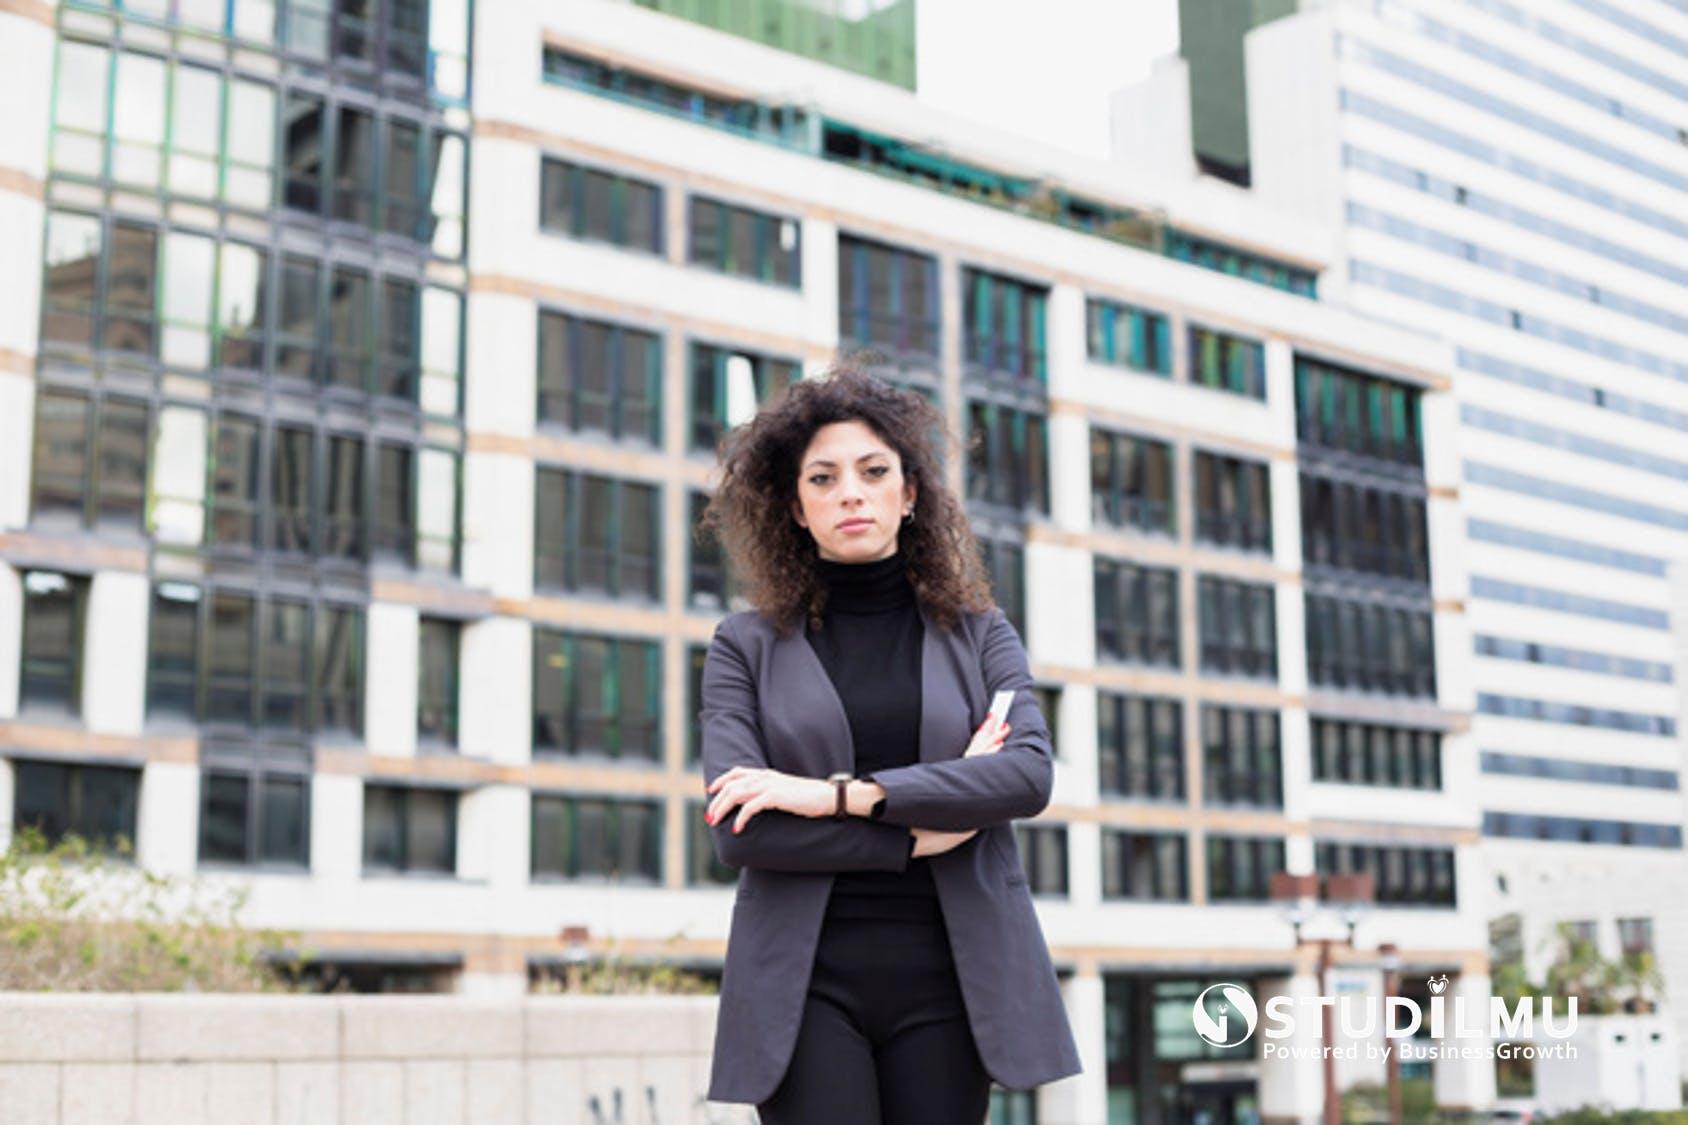 STUDILMU Career Advice - 5 Tantangan Yang Dihadapi Wanita Karier